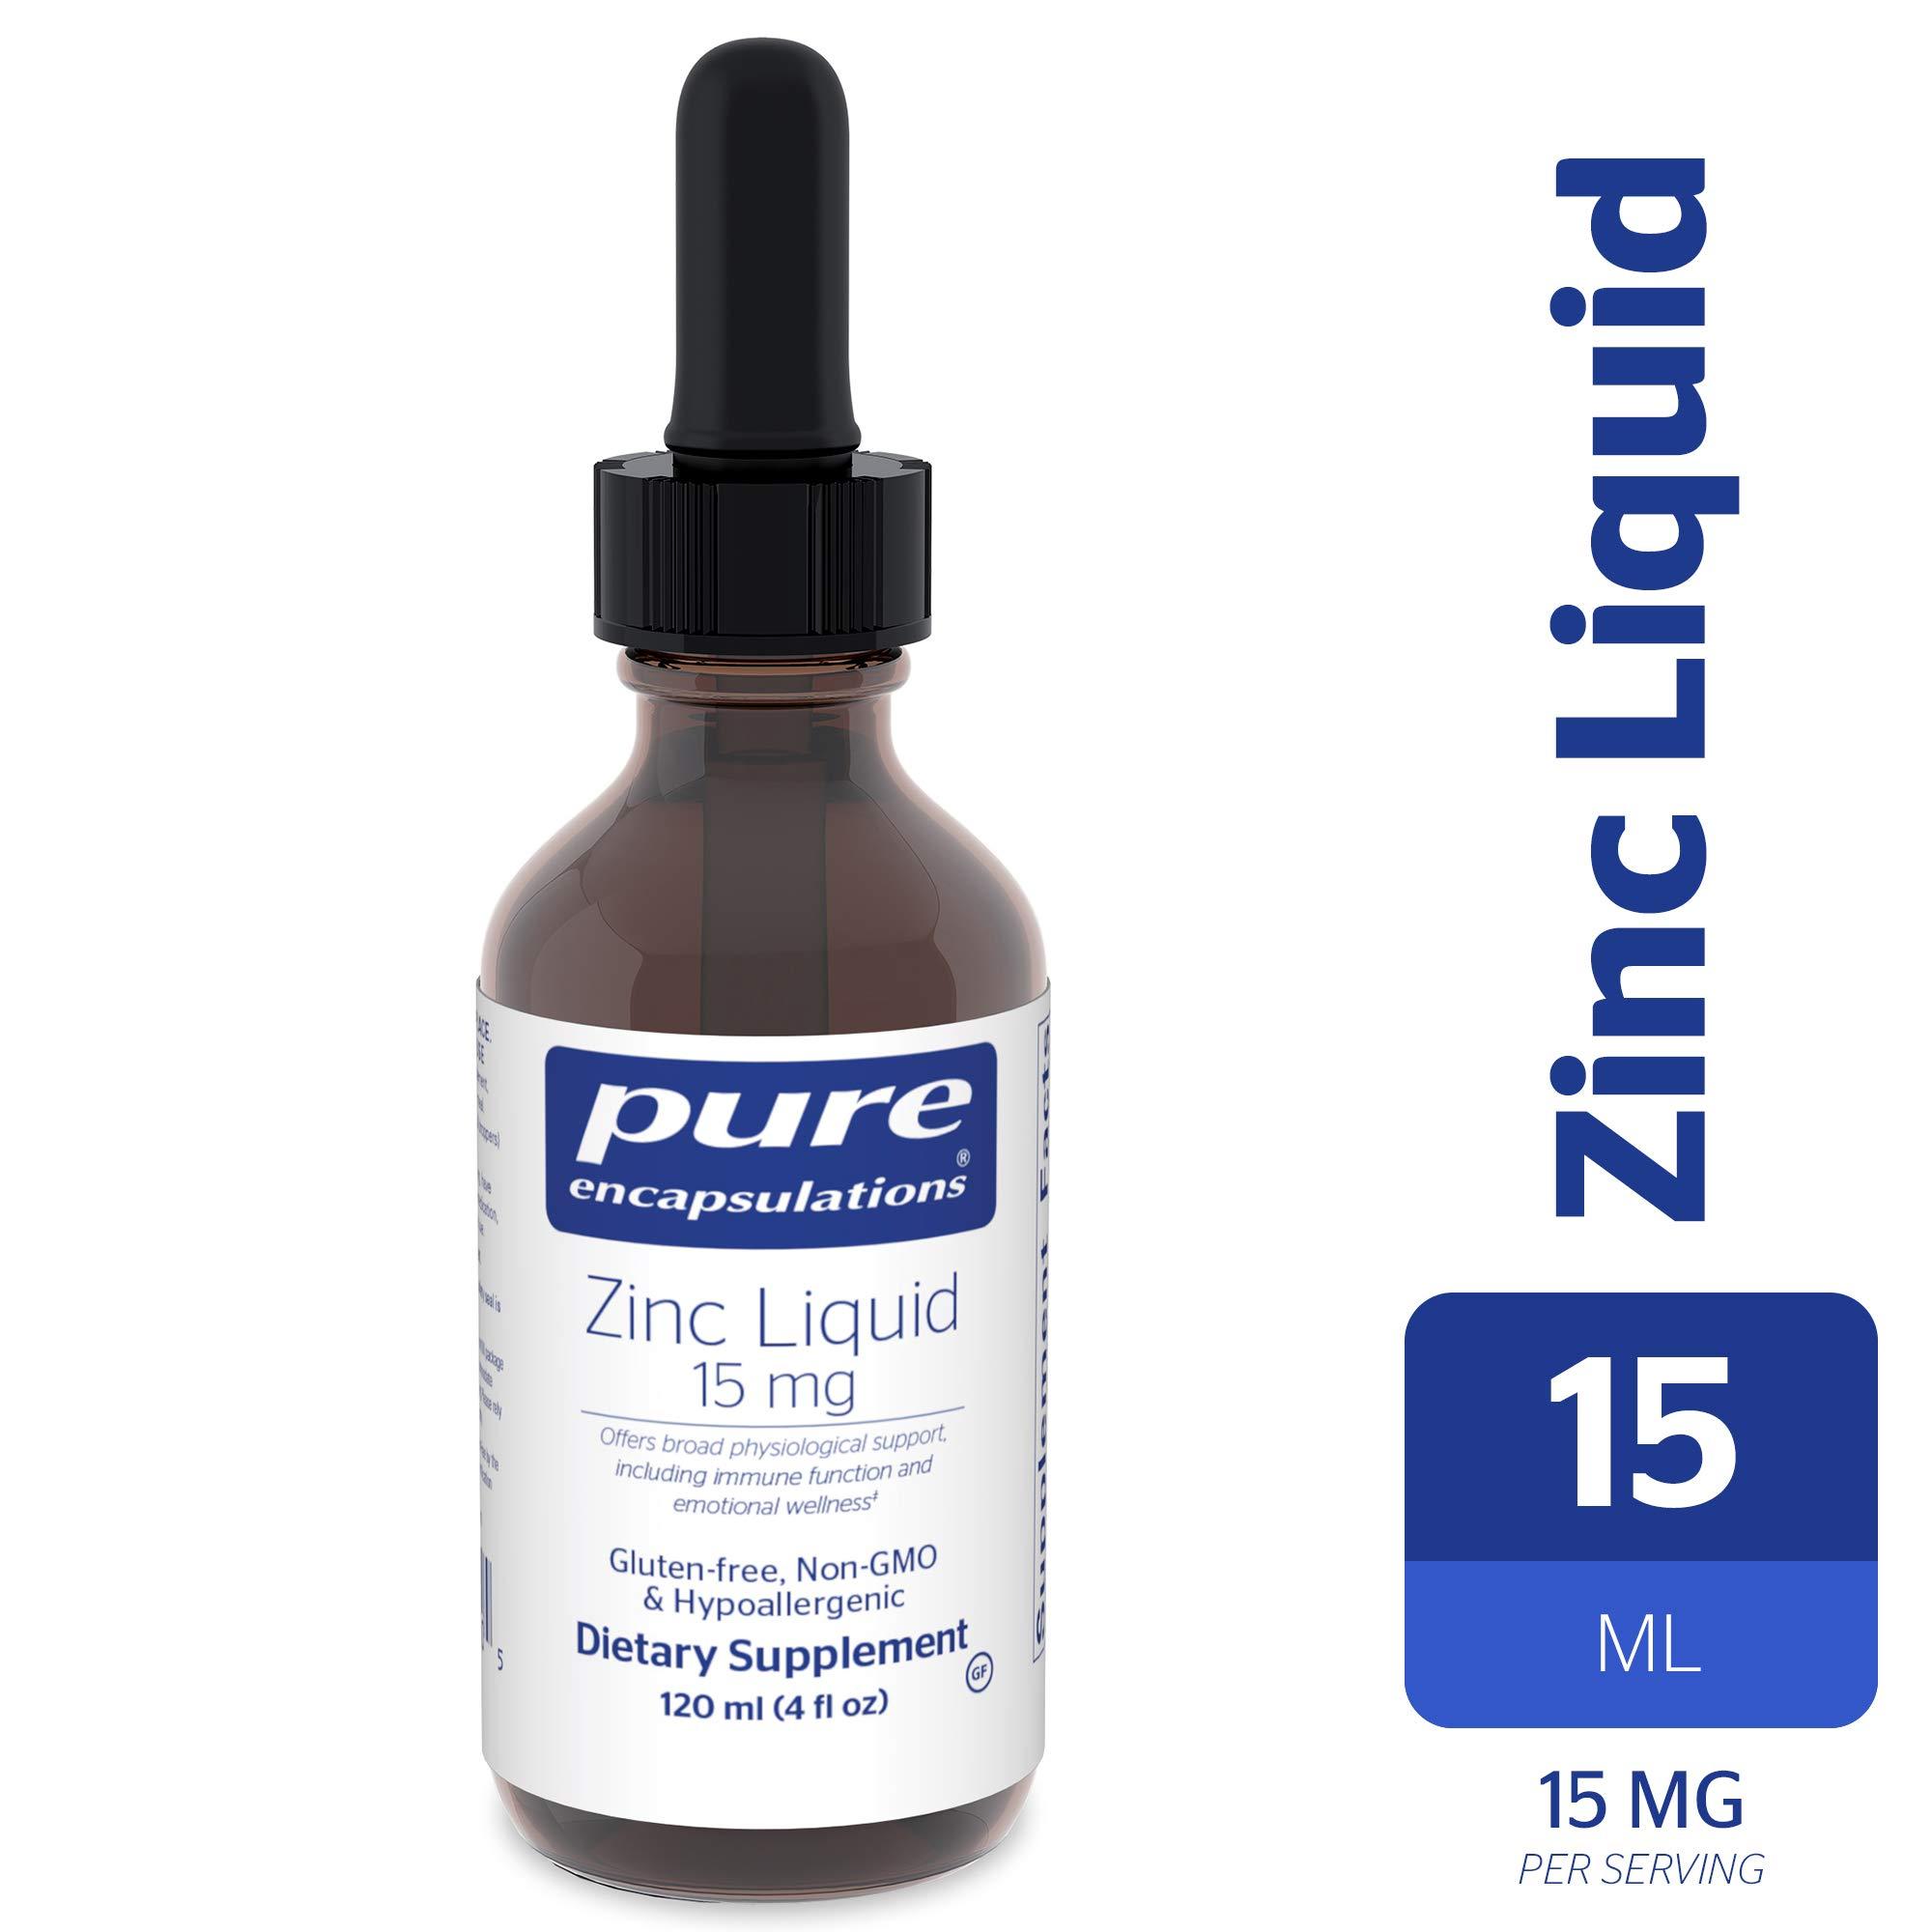 Pure Encapsulations - Zinc Liquid 15 mg - Zinc Gluconate Hypoallergenic Supplement for Immune Support* - 120 ml (4 fl oz)